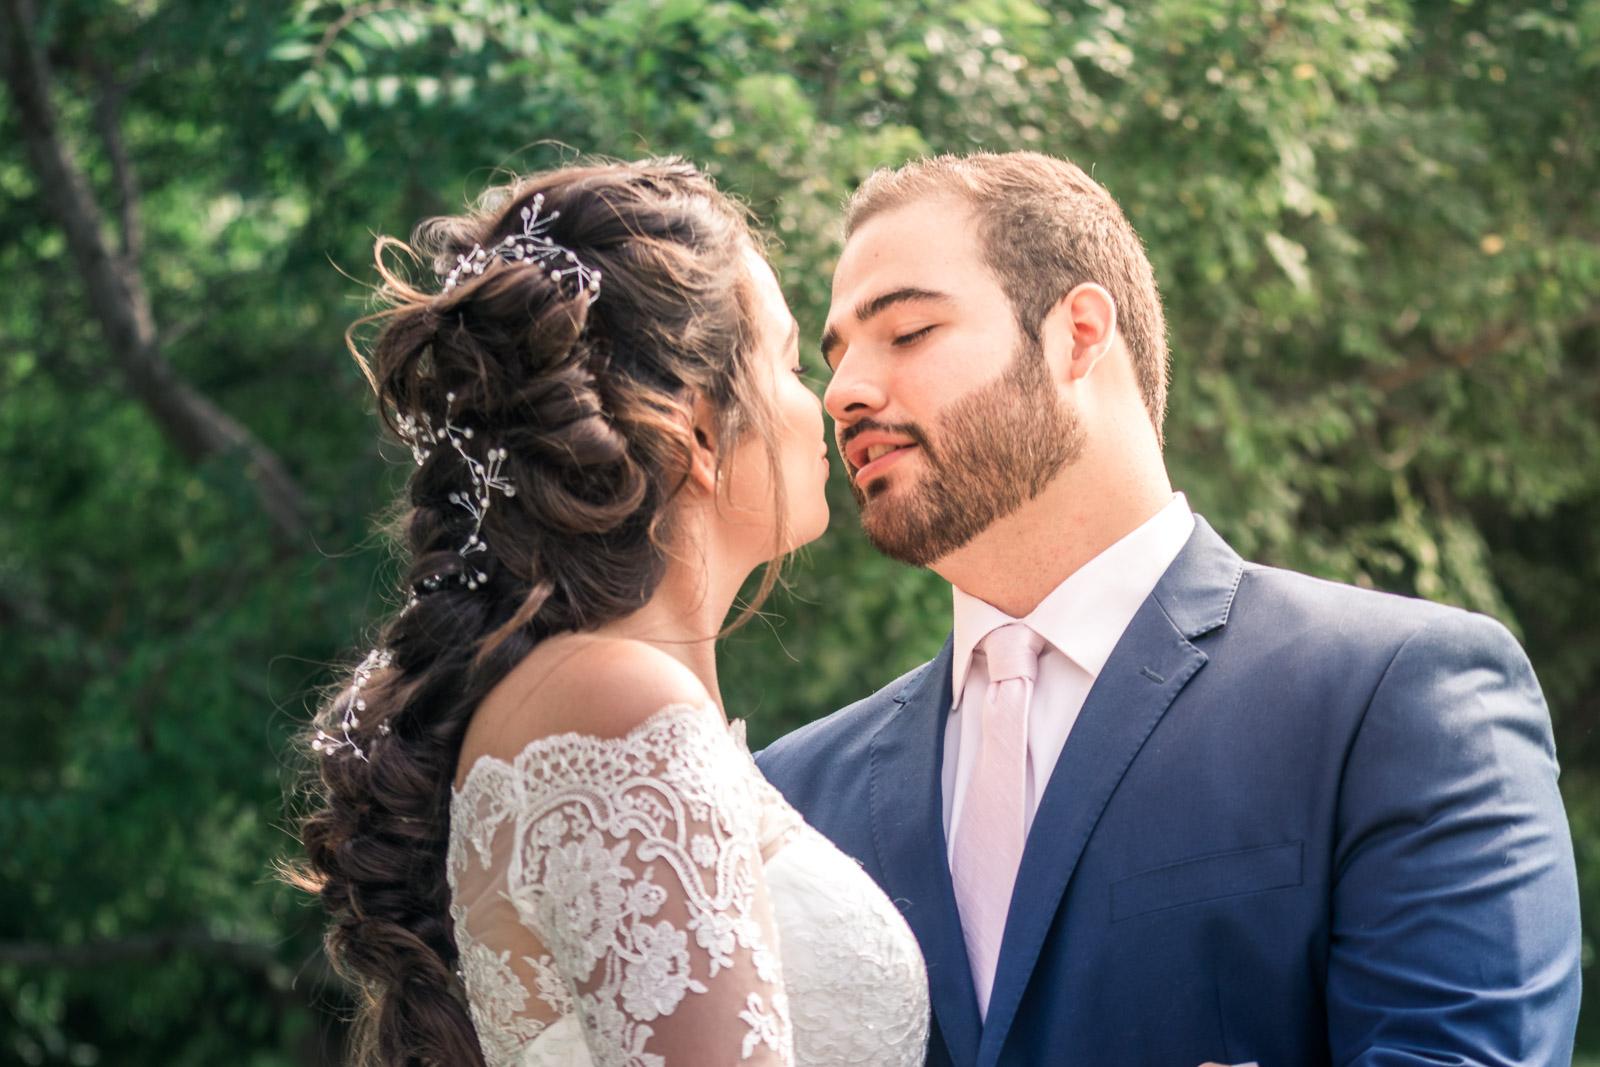 42_Angel-Brea-Orange-County_Joseph-Barber-Wedding-Photography.jpg